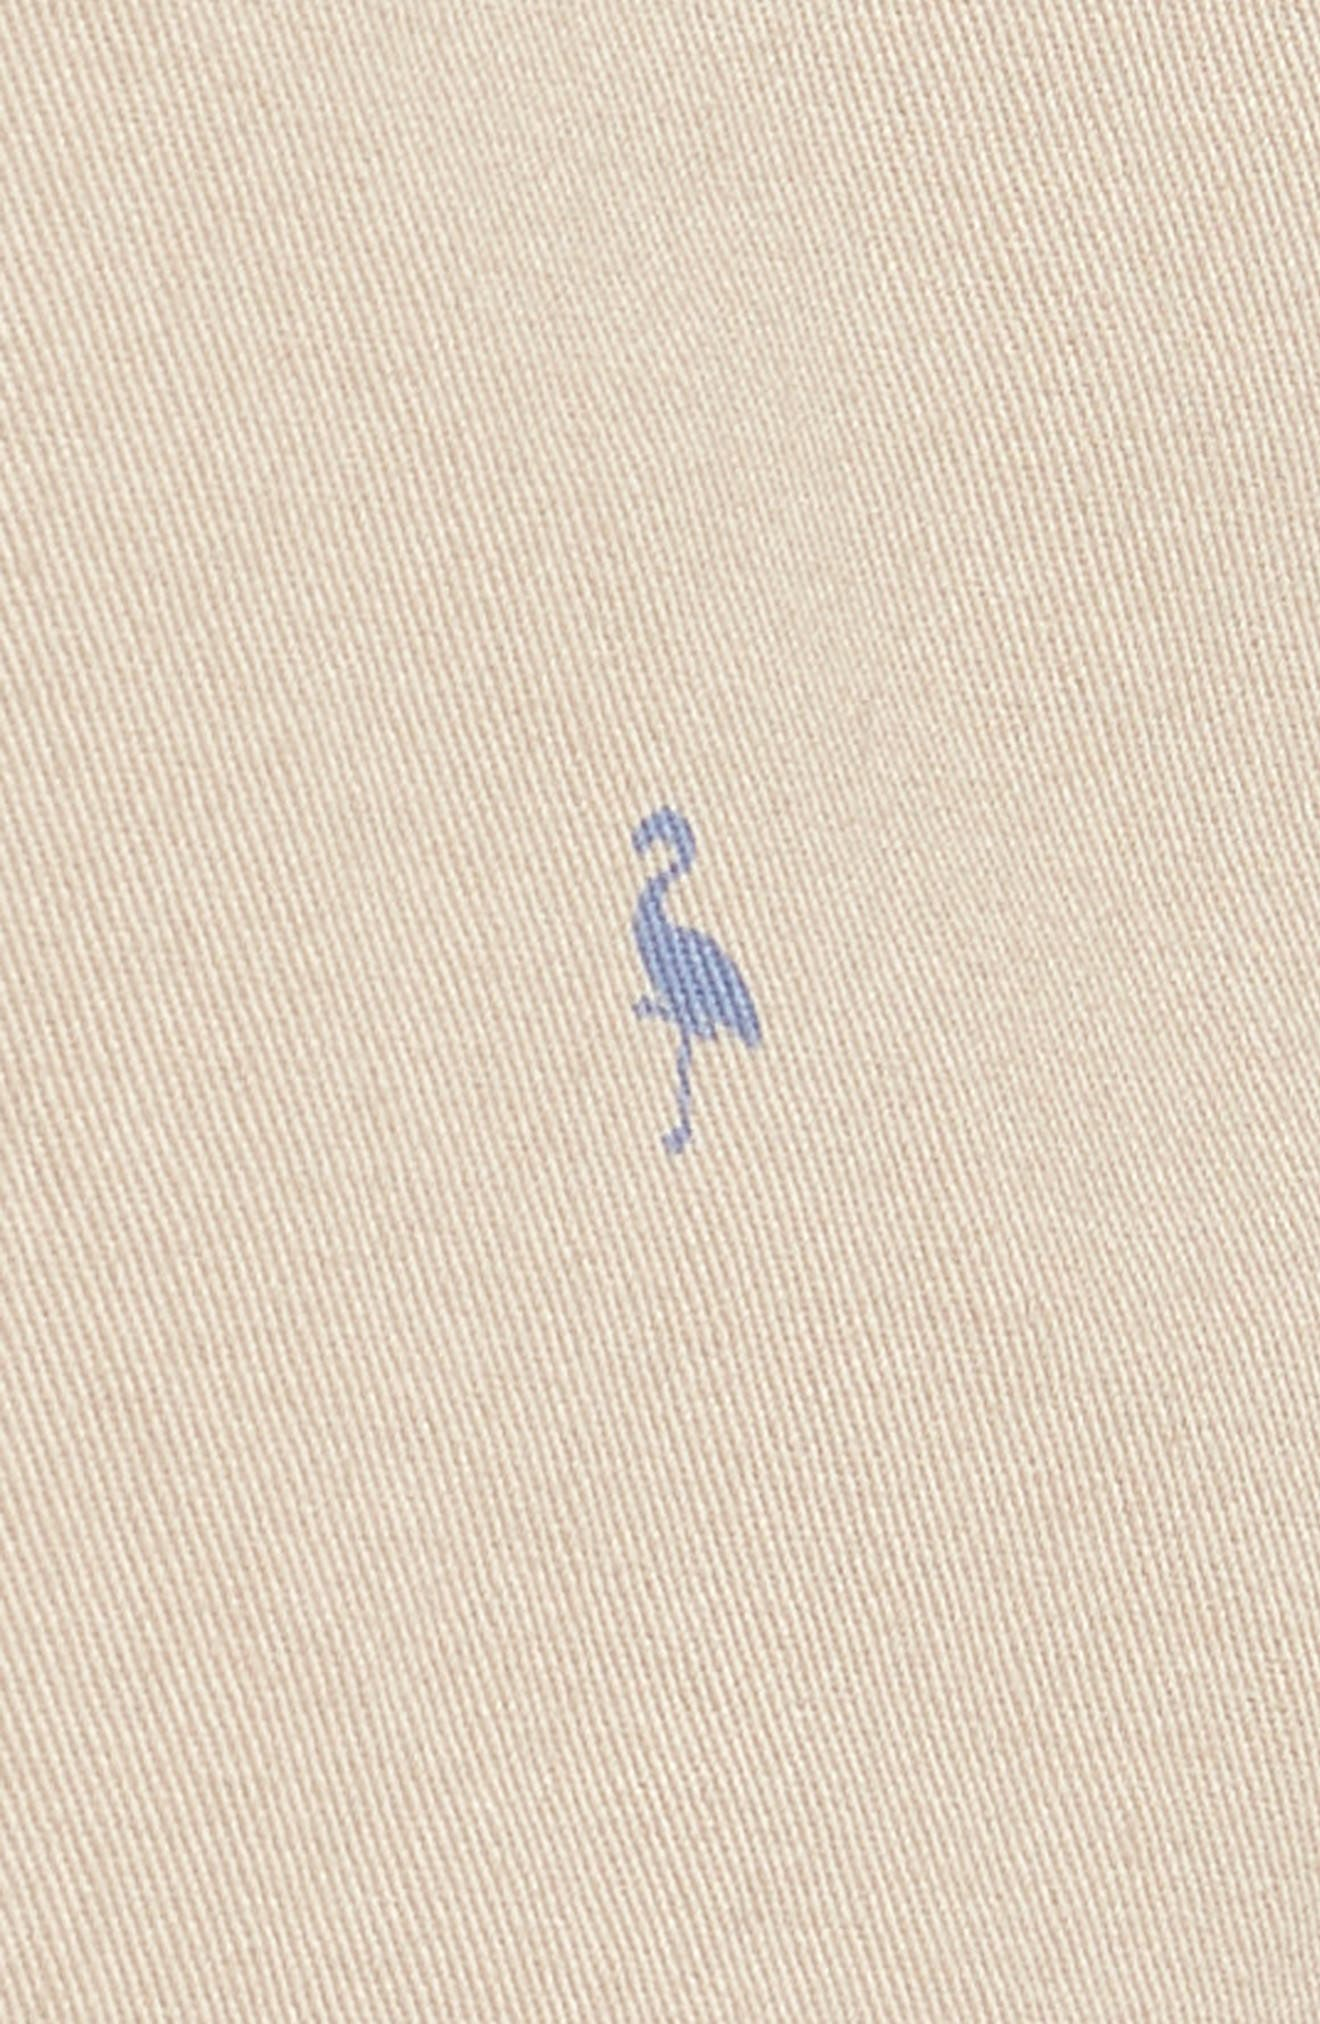 Baden Bird Regular Fit Chino Shorts,                             Alternate thumbnail 5, color,                             Dark Khaki